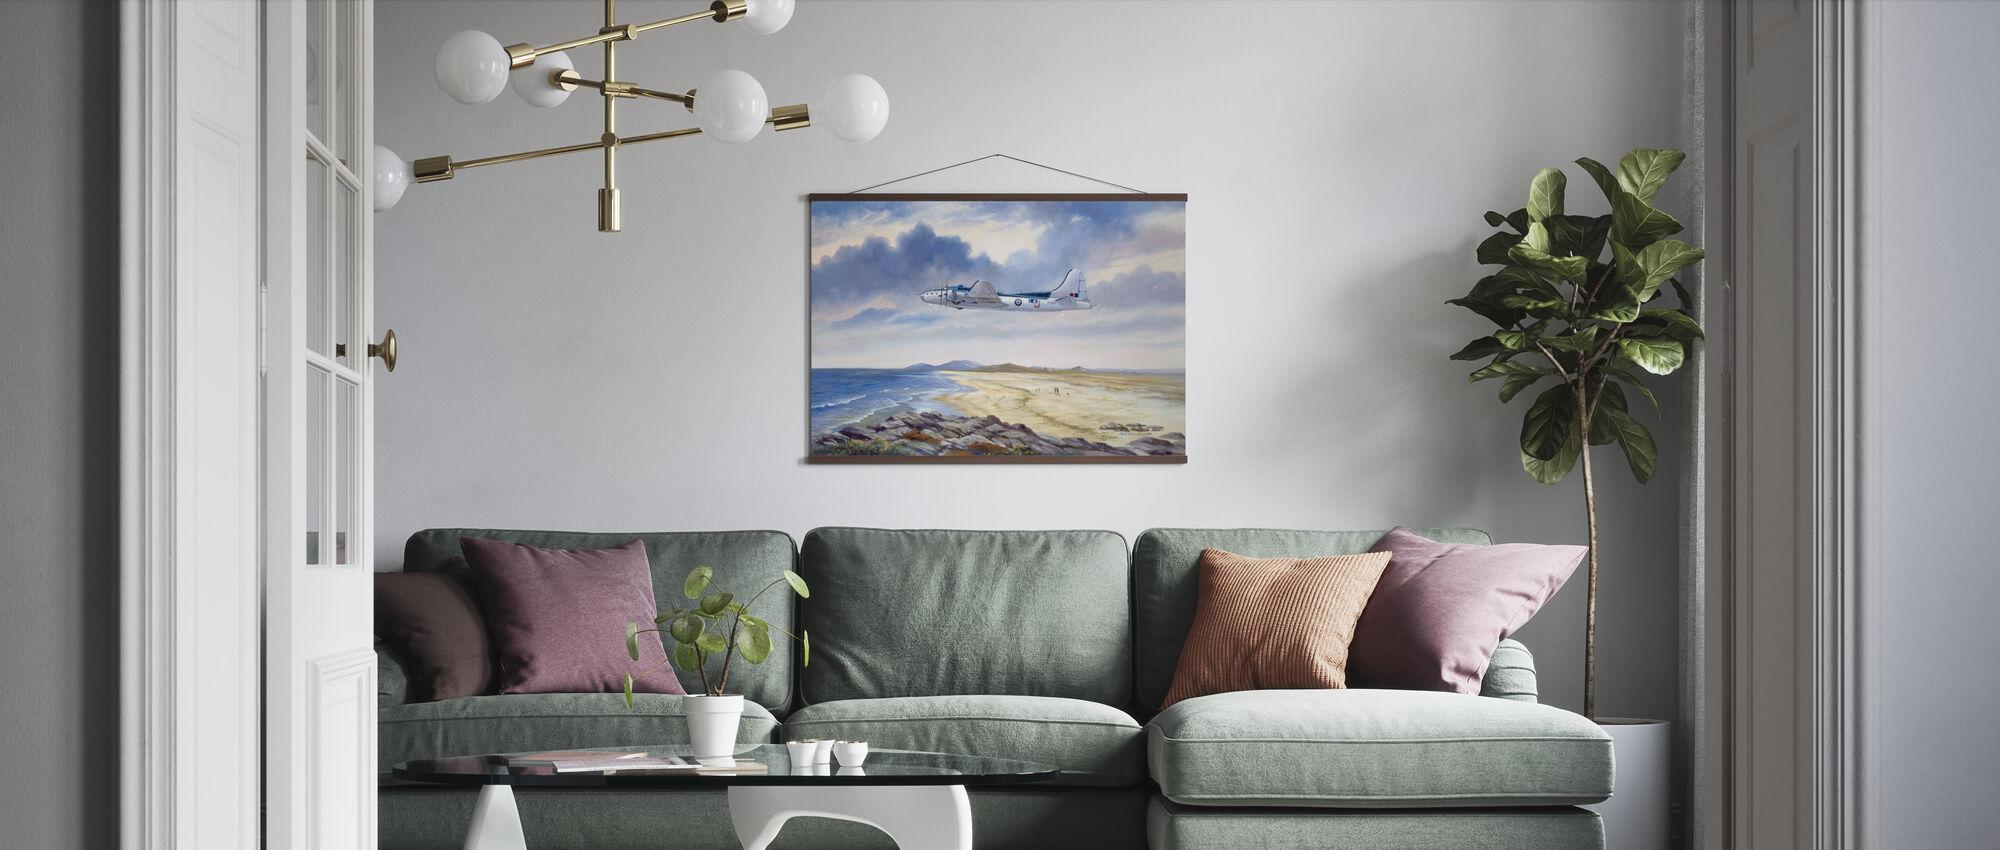 B17 Over Benbecula - Poster - Living Room